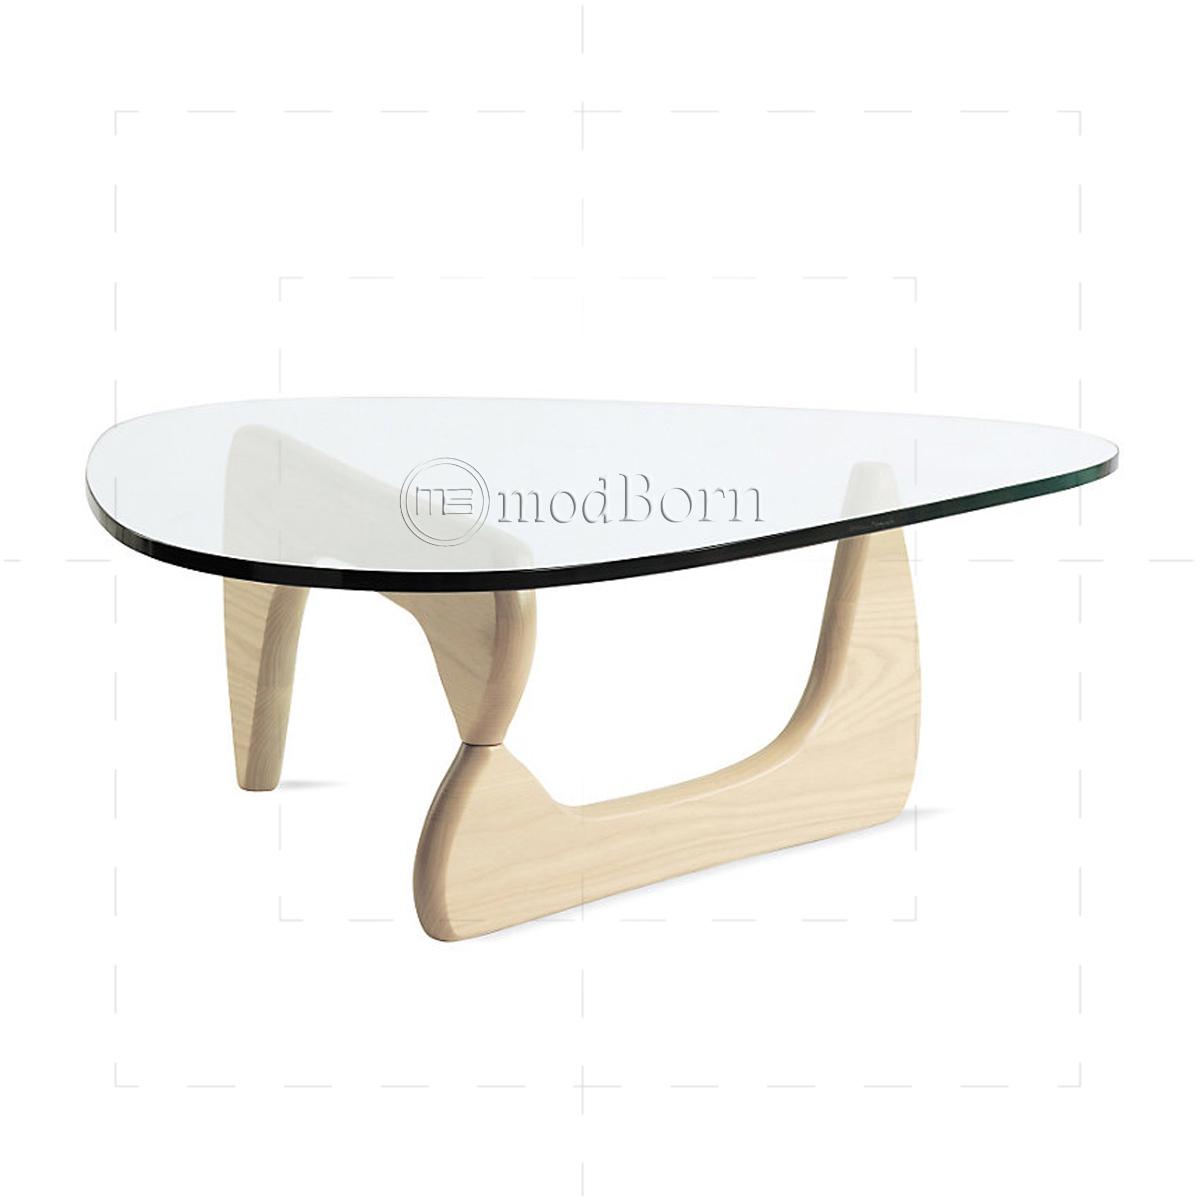 lsamu Noguchi Style Coffee Table ASHWood Replica : isamu noguchi table white side 1200x1200 from www.modborn.com size 1200 x 1200 jpeg 232kB